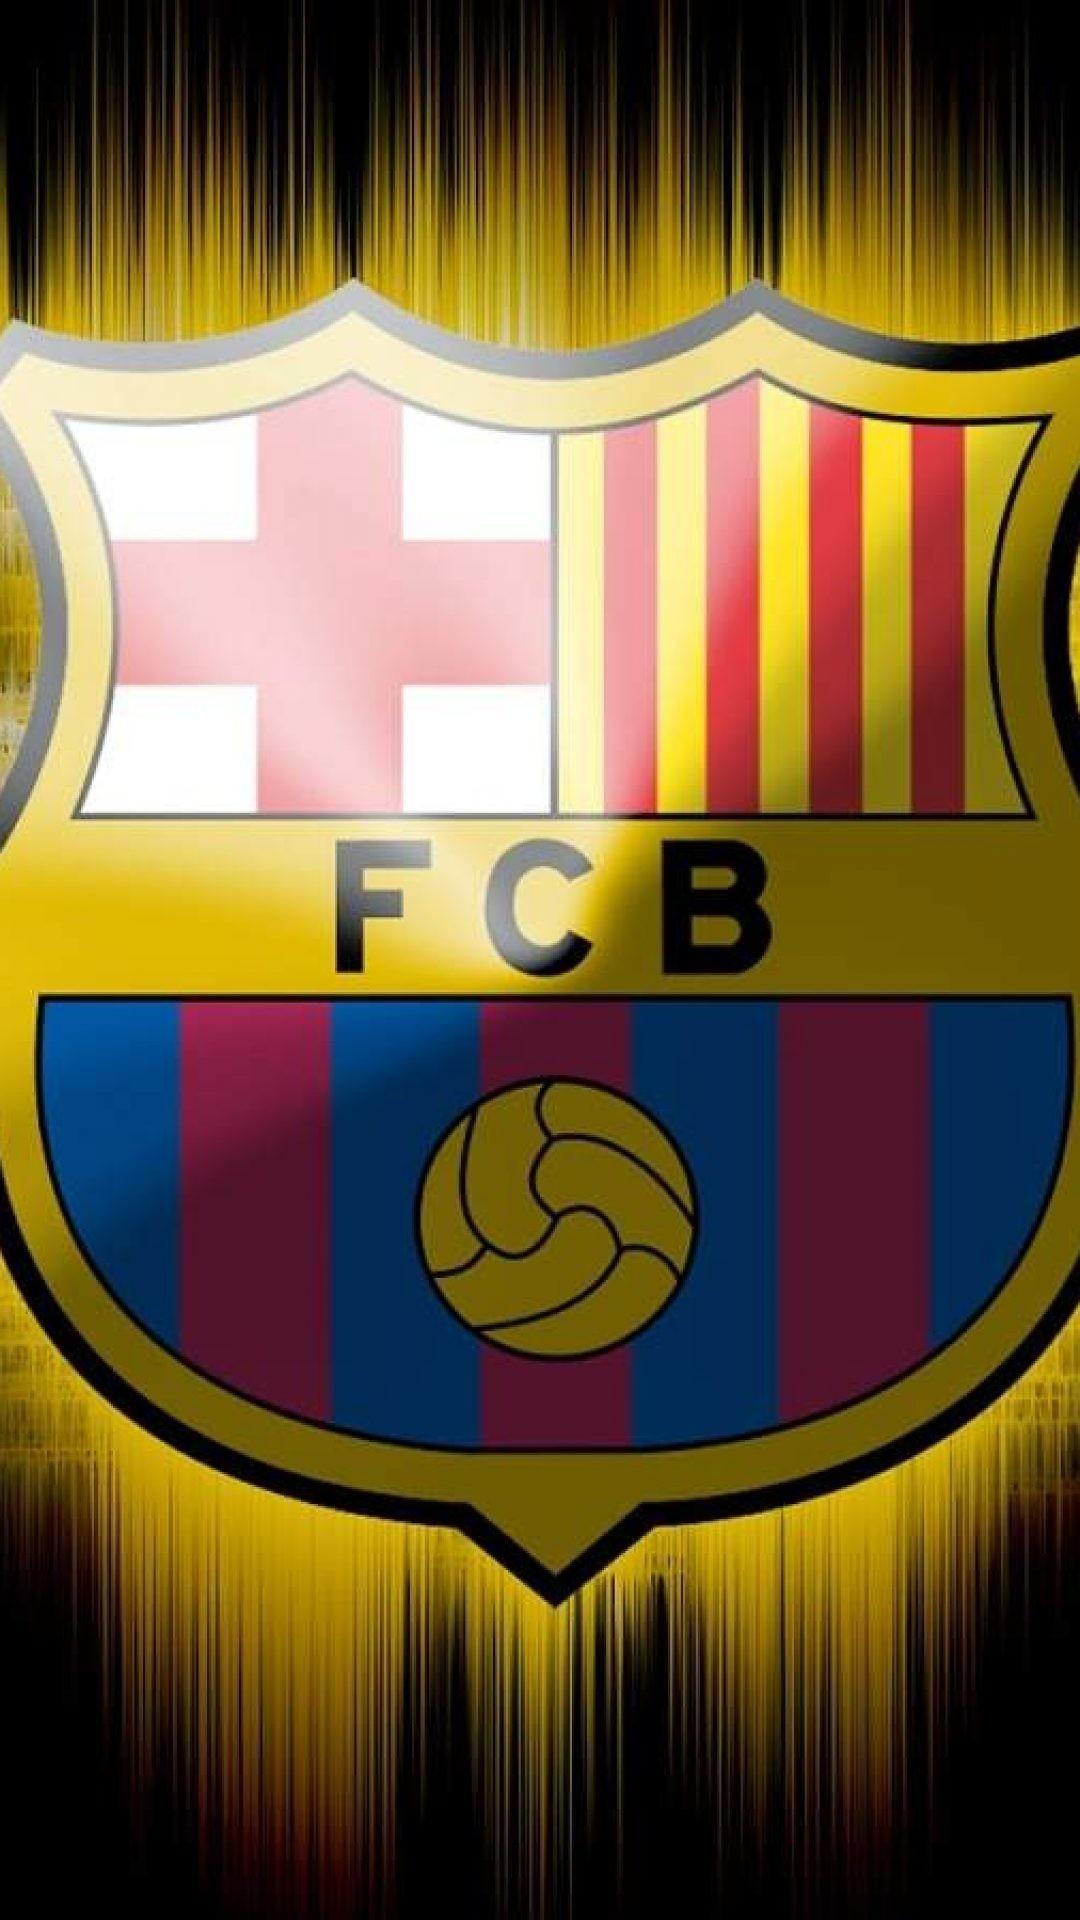 Fc Barcelona Wallpaper Hd 2014